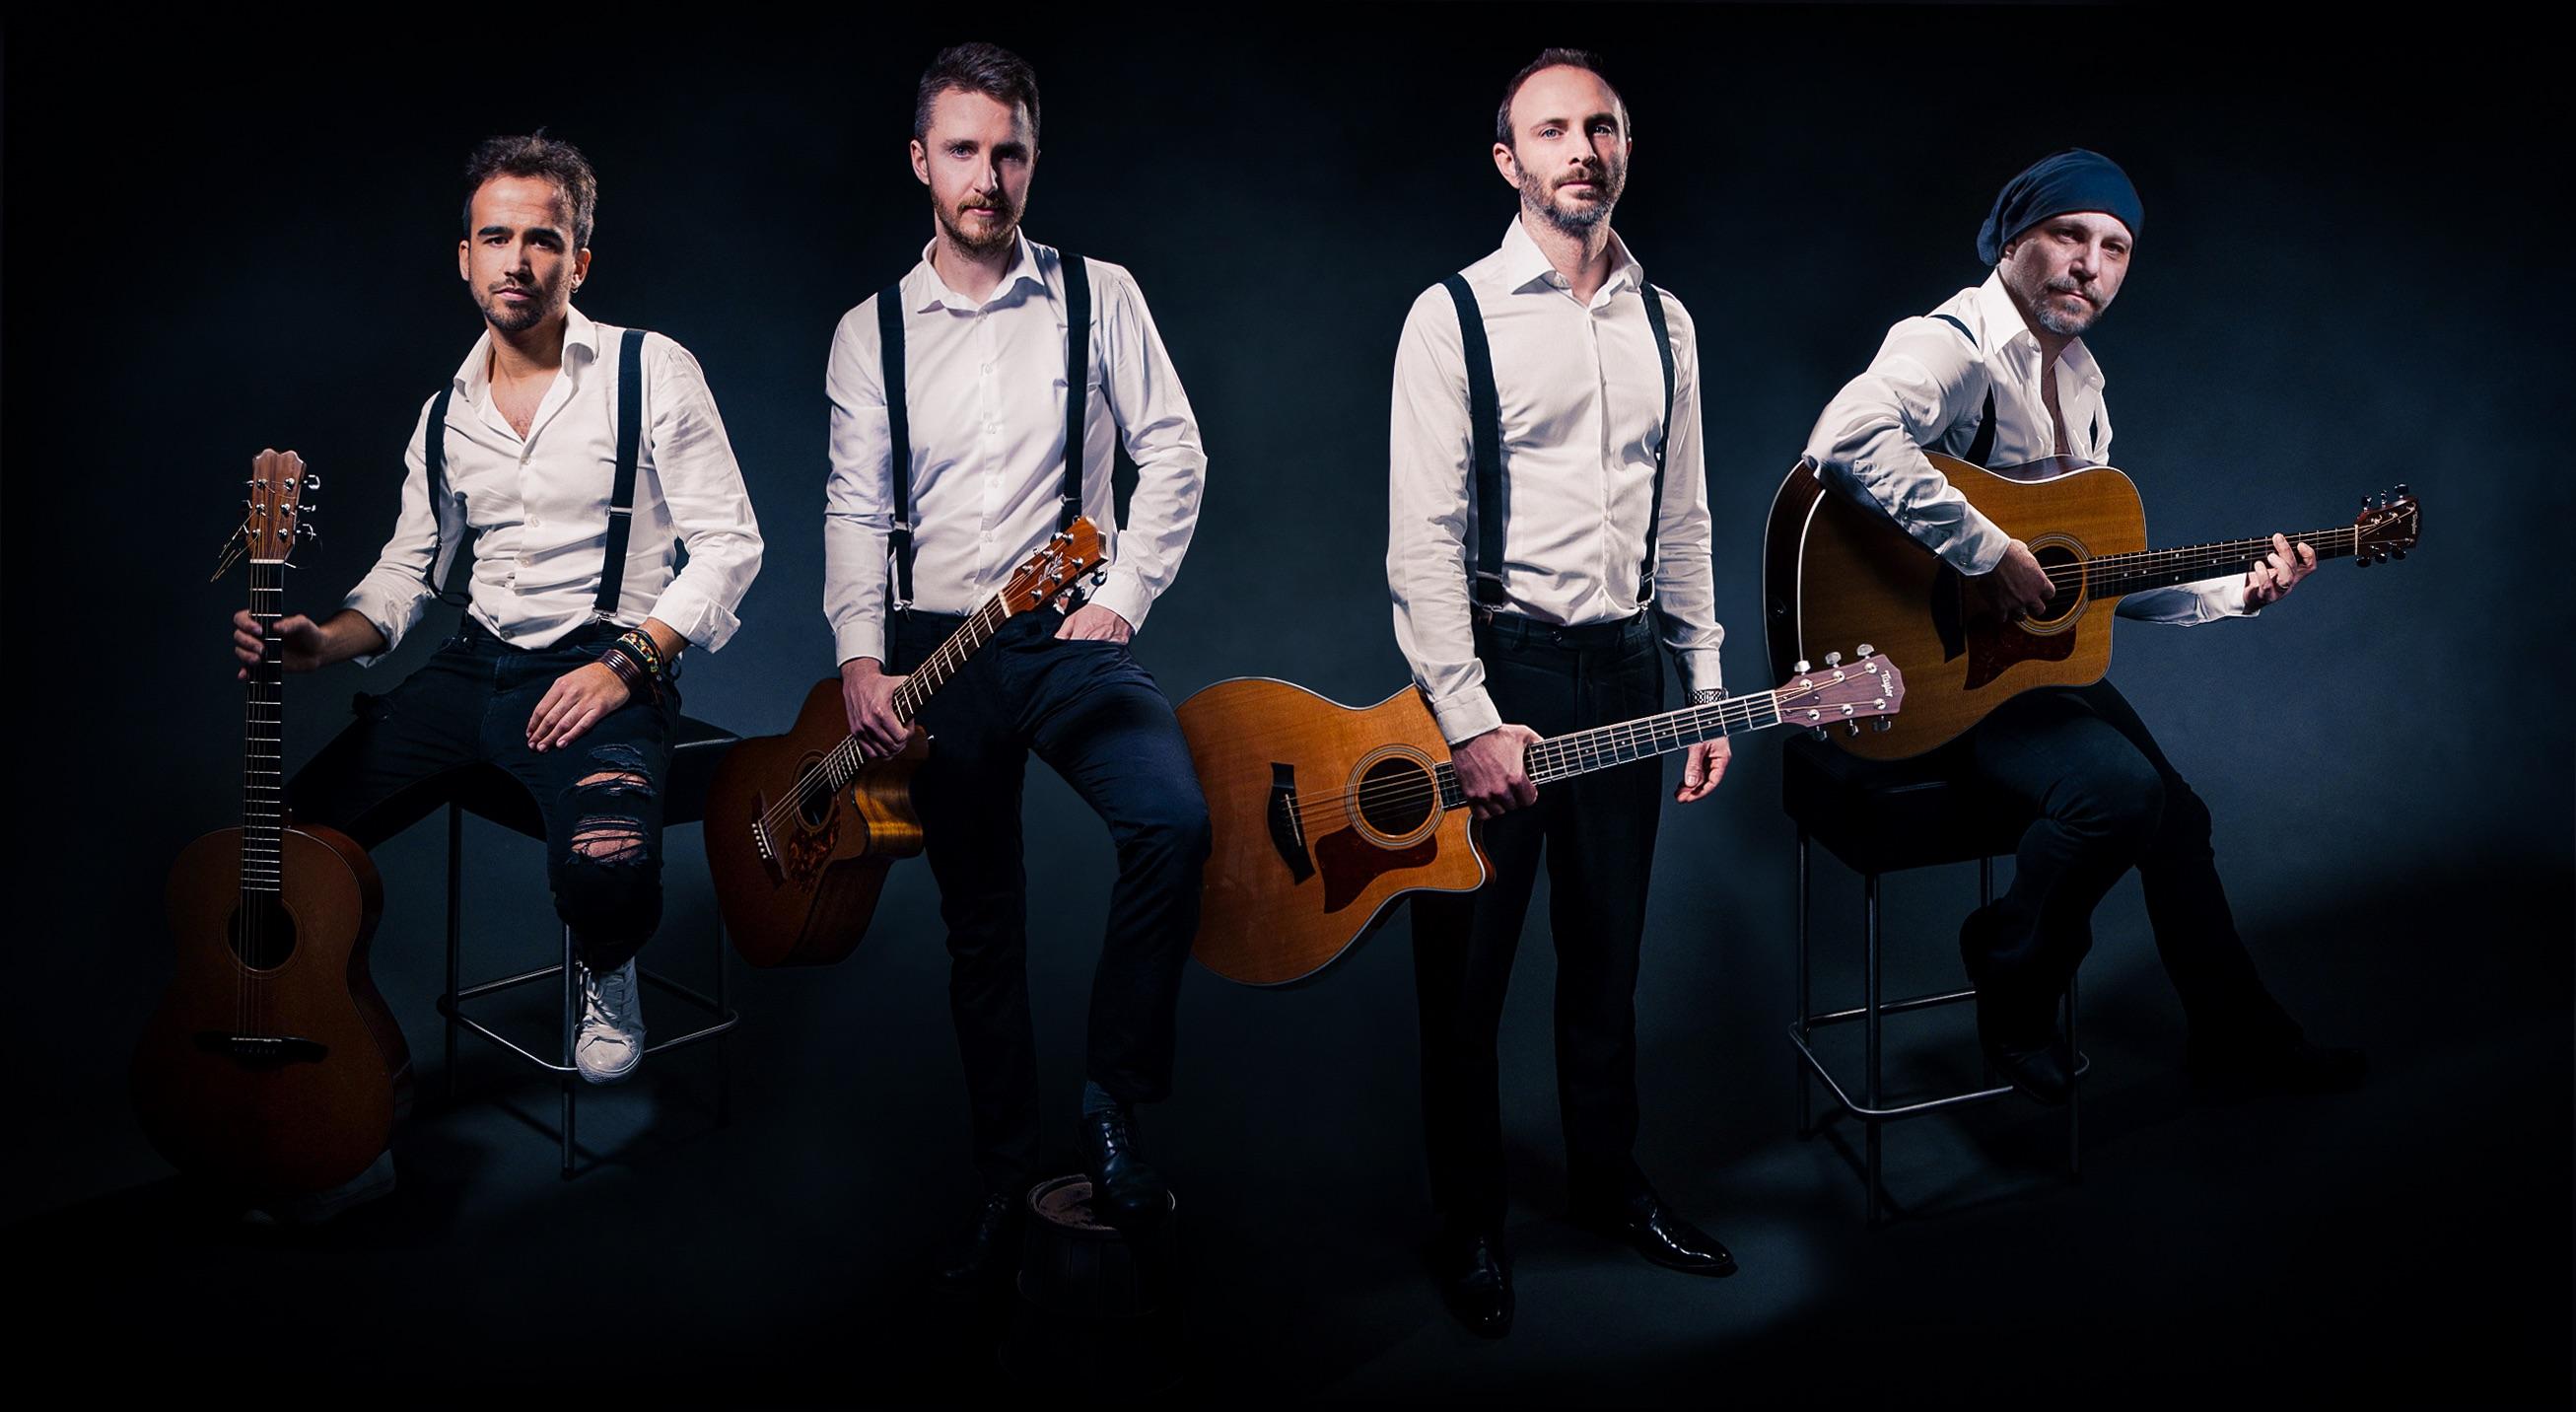 Intervista 40 Fingers Guitar Quartet il 06.04.19 al Bobbio (Ts)